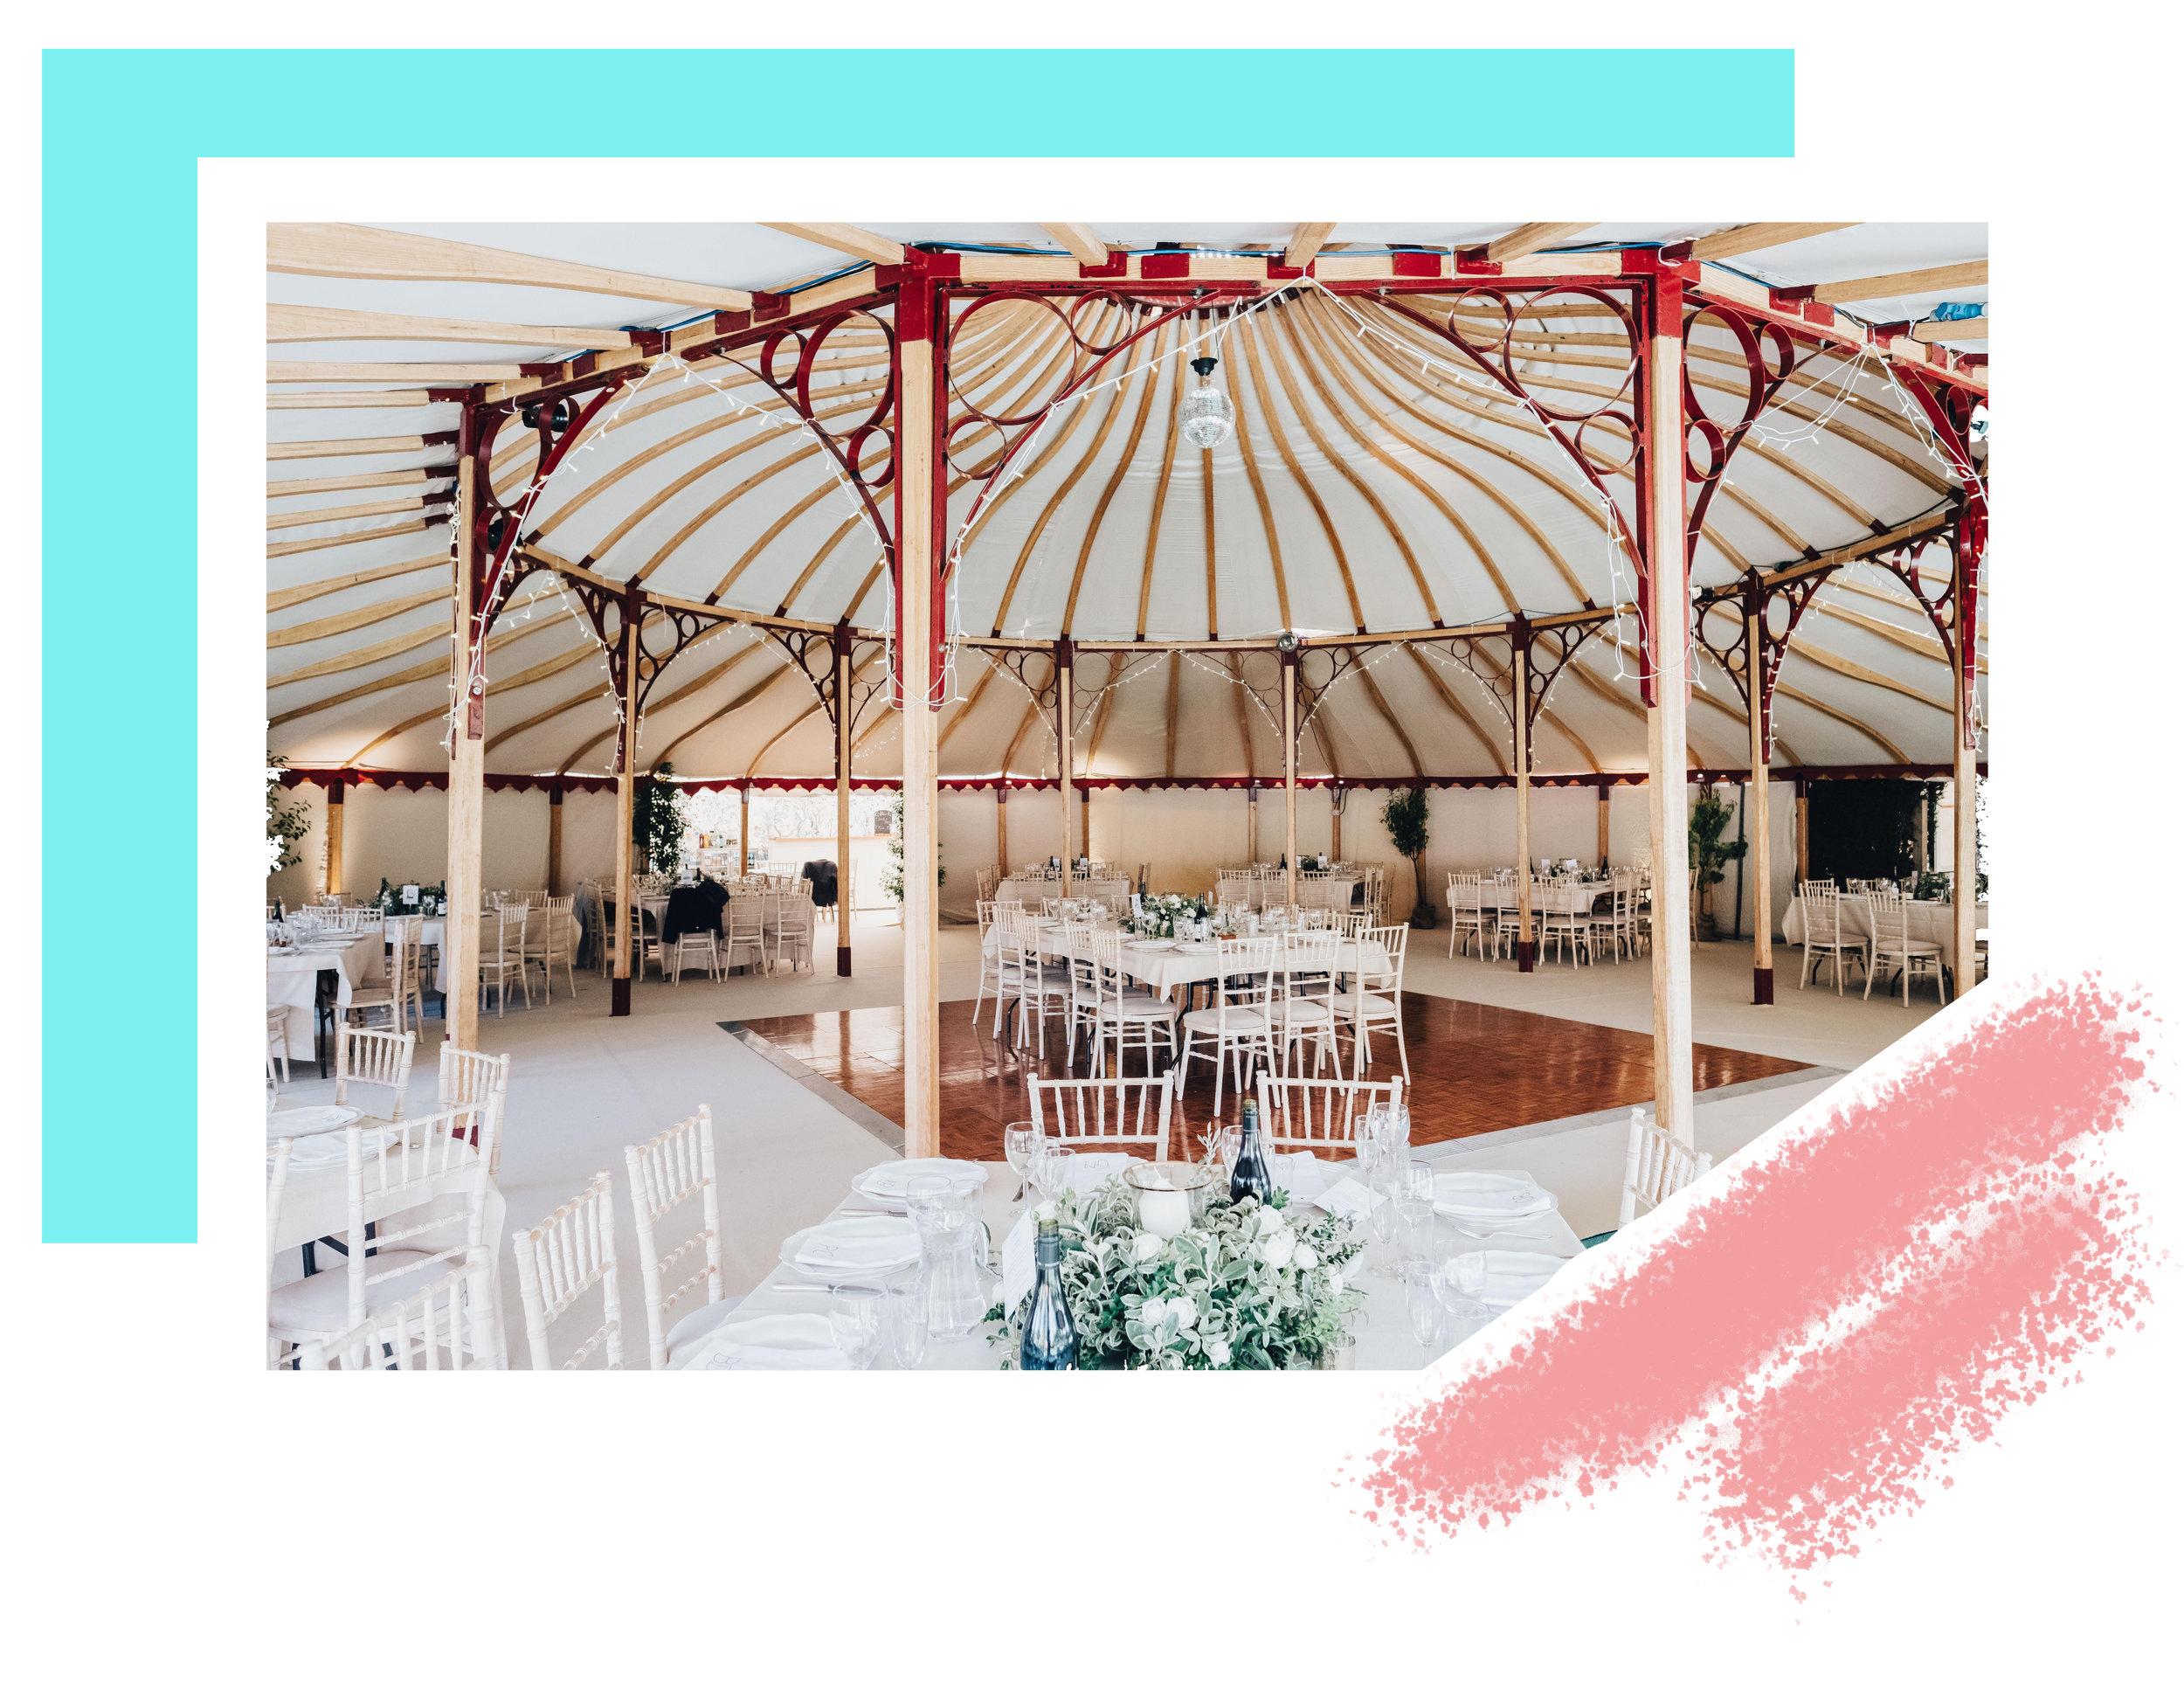 Wedding Tent copy.jpg